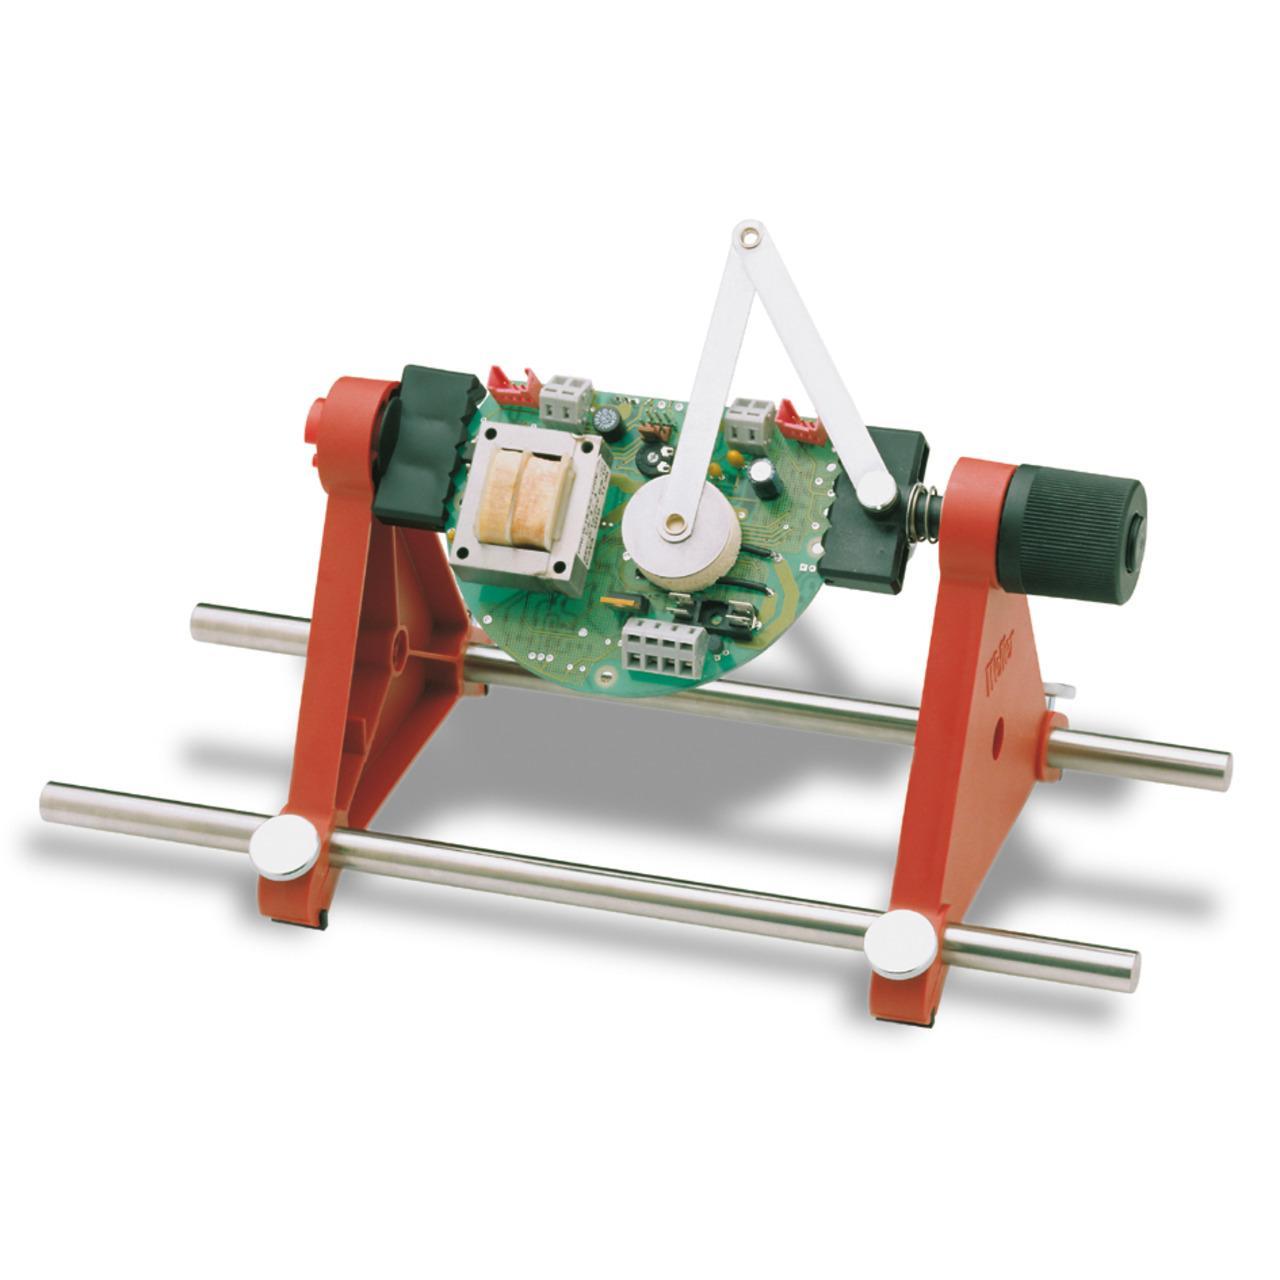 Weller Euro Solder Fix 120 Platinenhalter, 360° schwenkbar